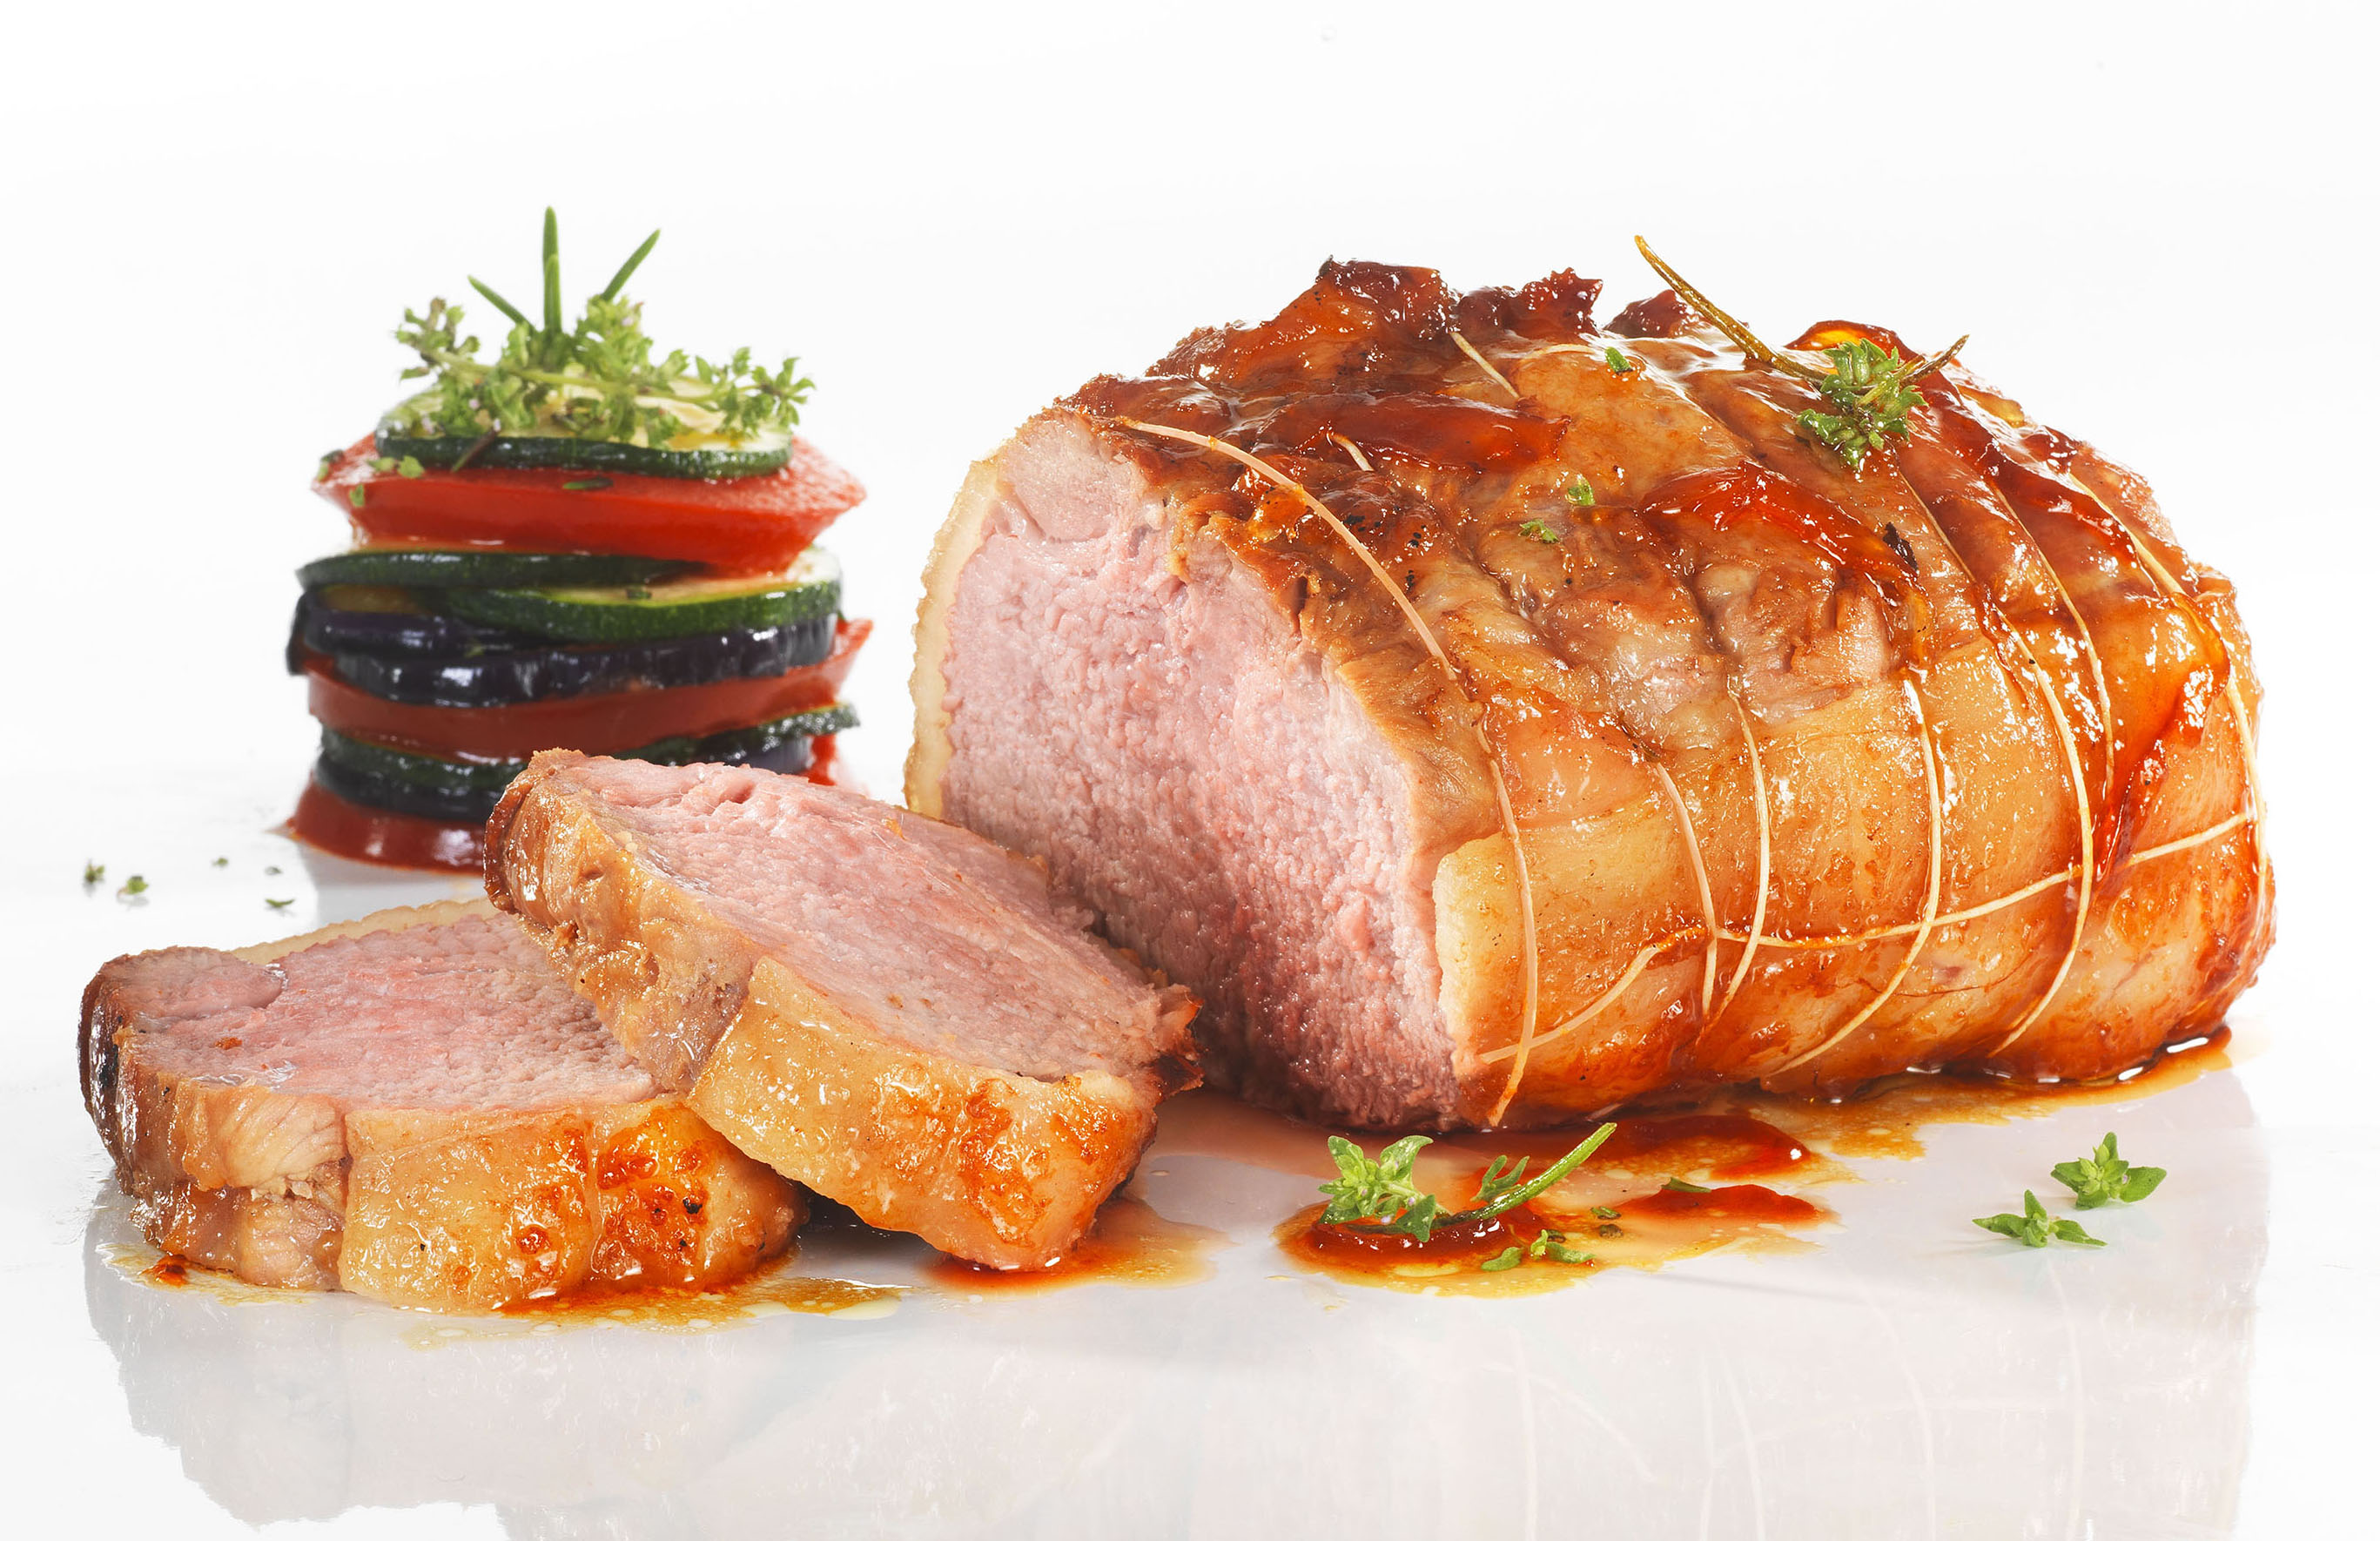 boucheries-andre-roti-veau-pentecote